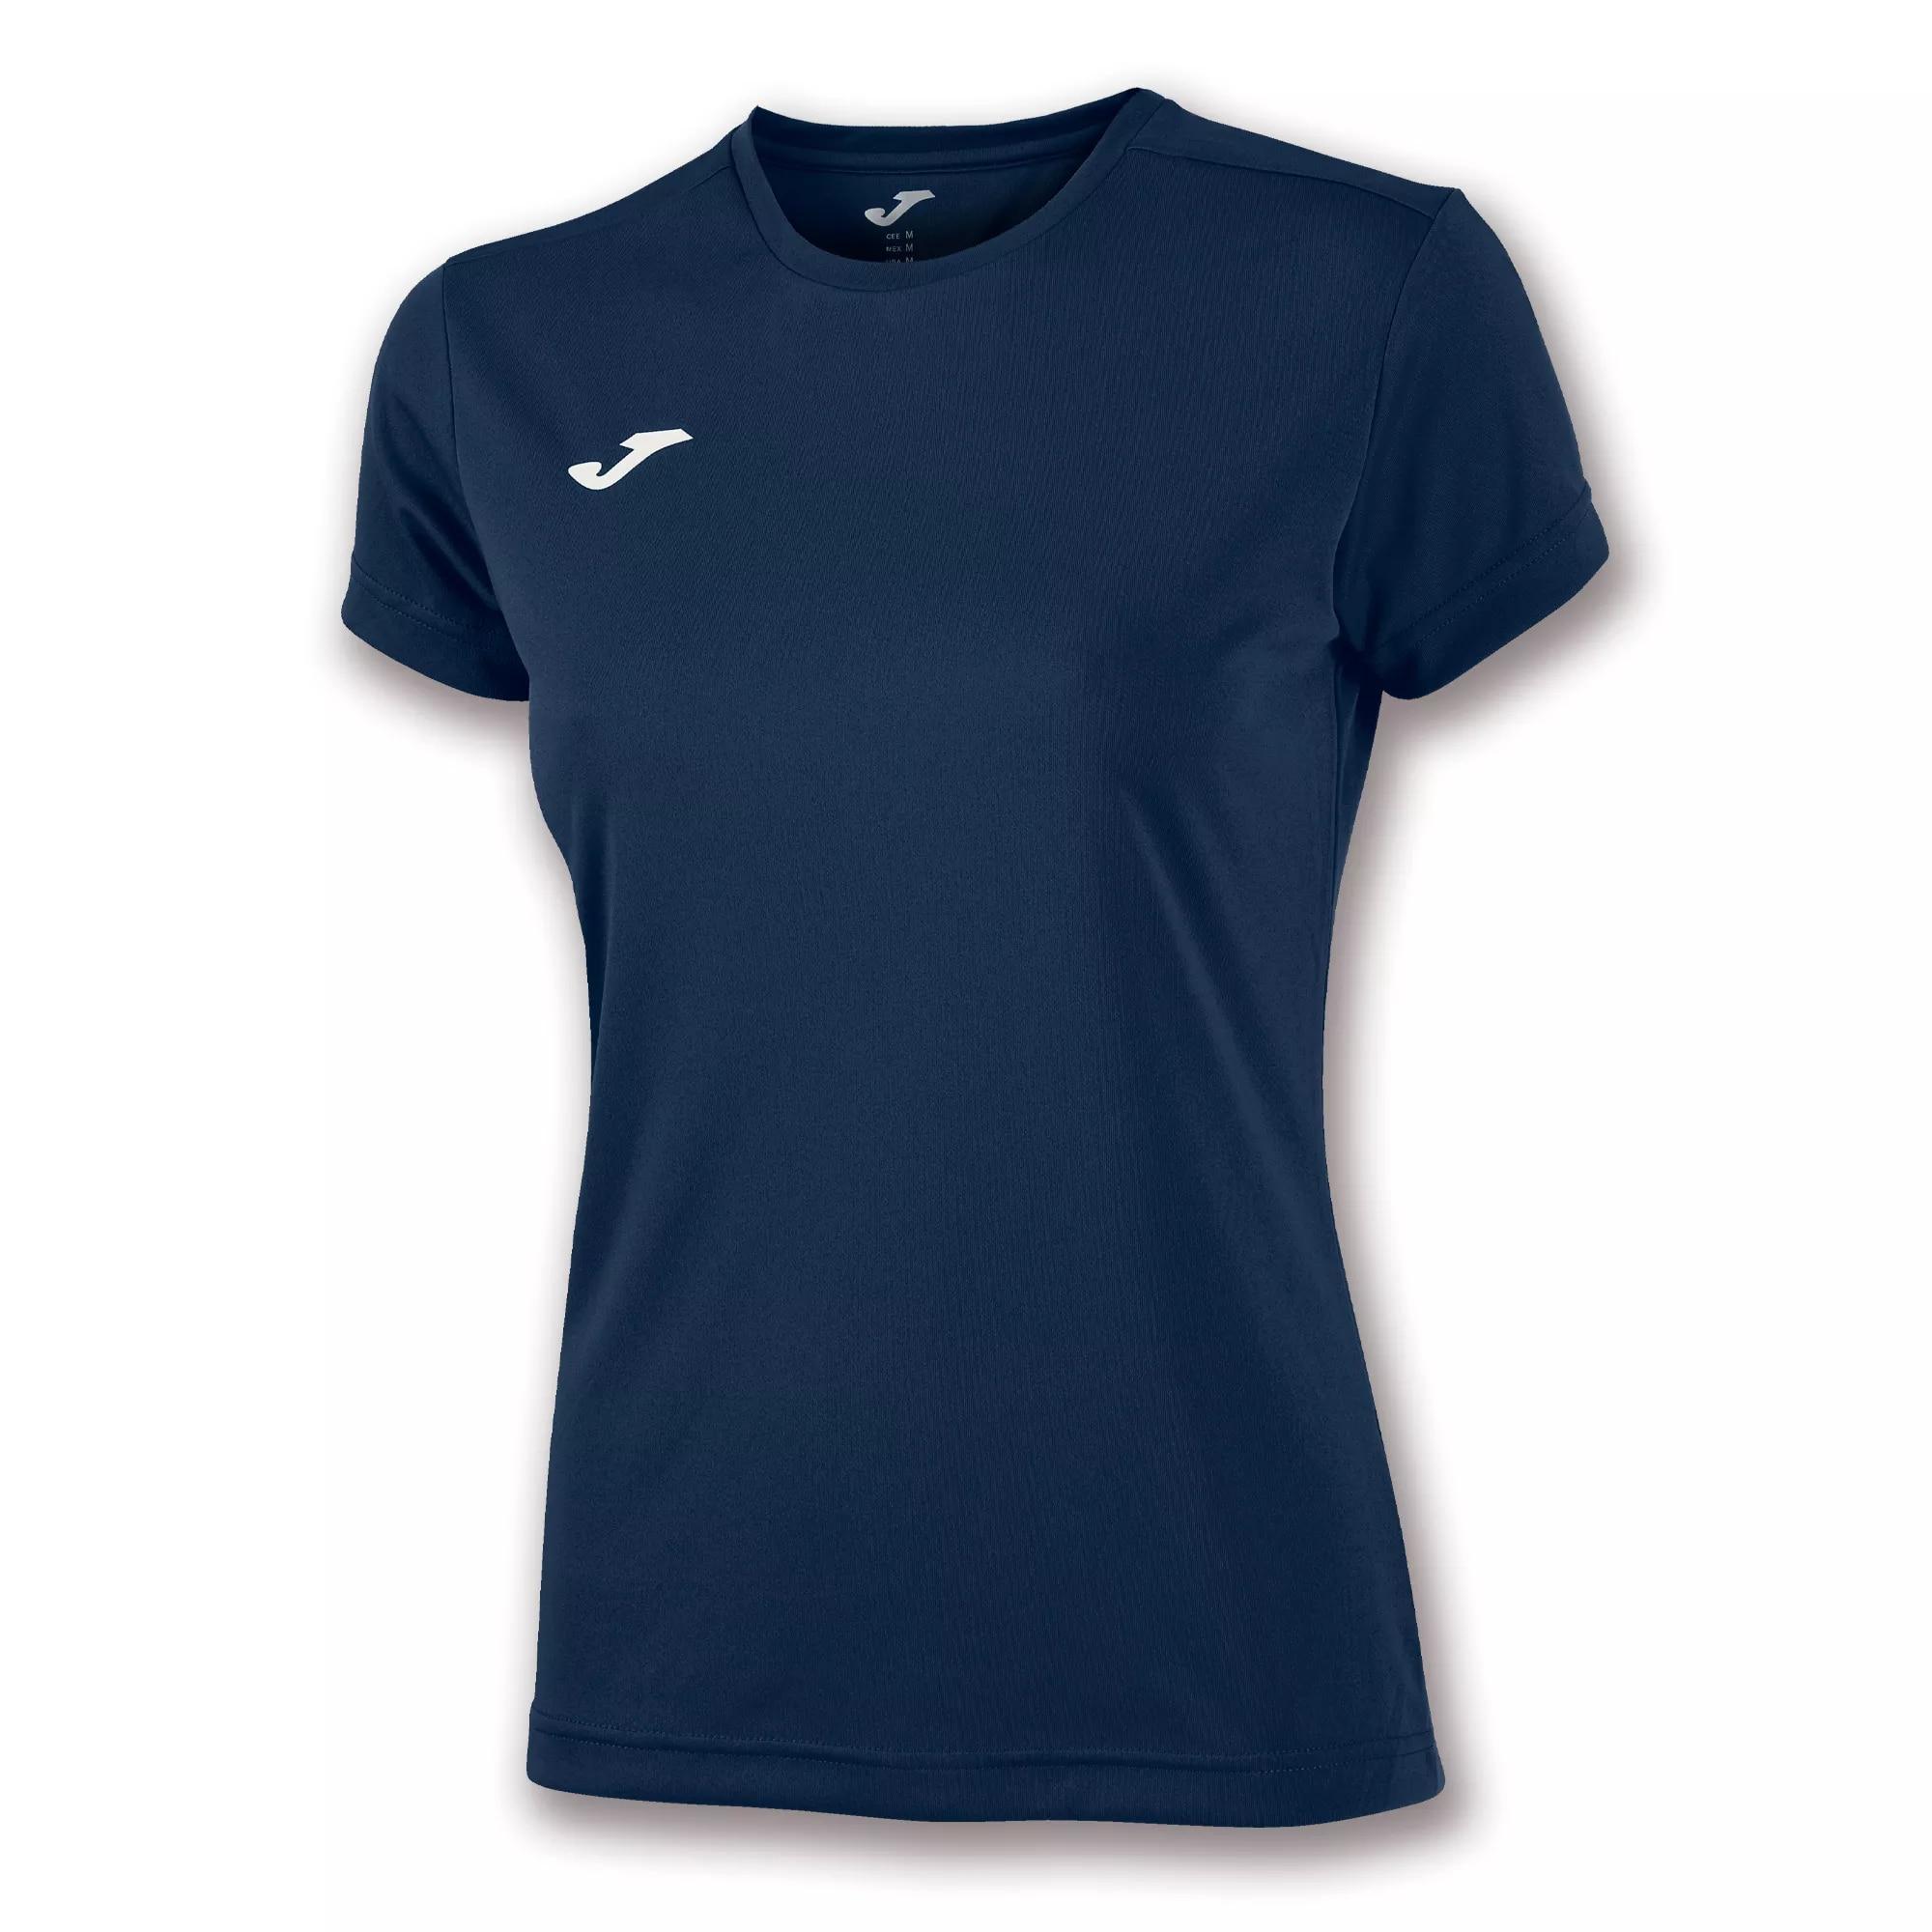 COMBI camiseta JOMA cuello redondo de deporte